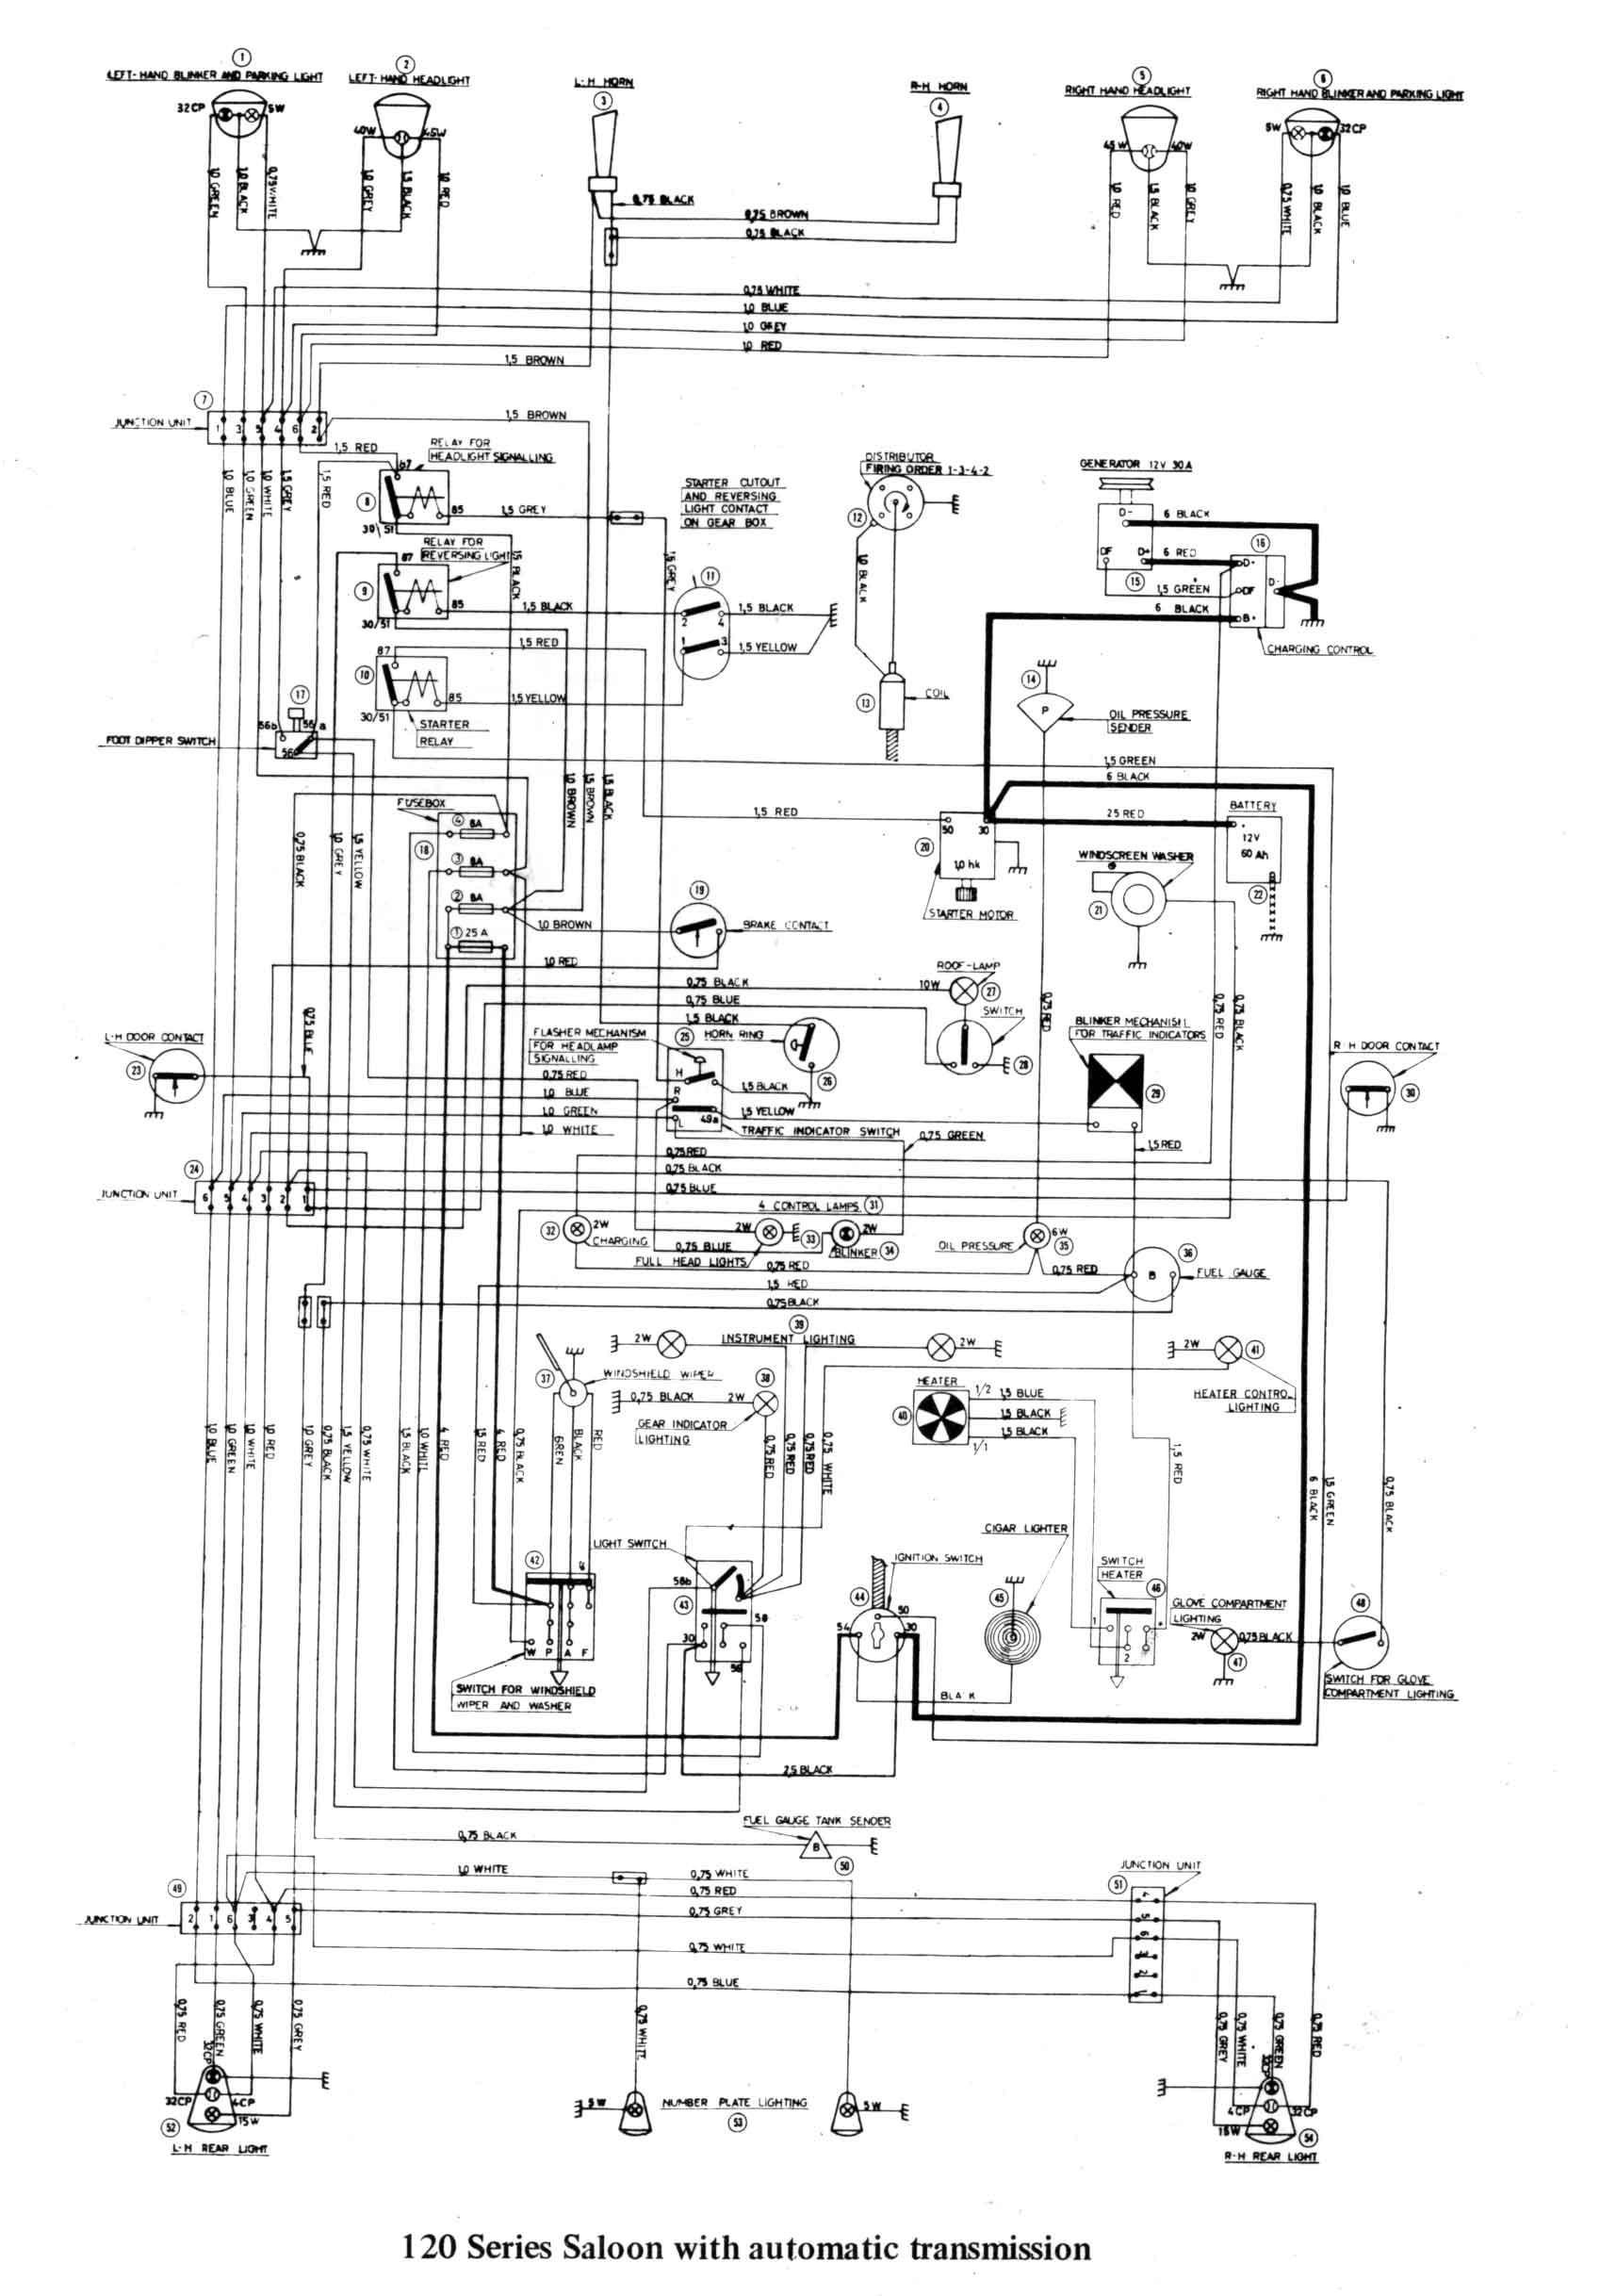 2004 Dodge Ram 1500 Engine Diagram Headlight Schematics for 2000 Dodge Ram Worksheet and Wiring Diagram • Of 2004 Dodge Ram 1500 Engine Diagram